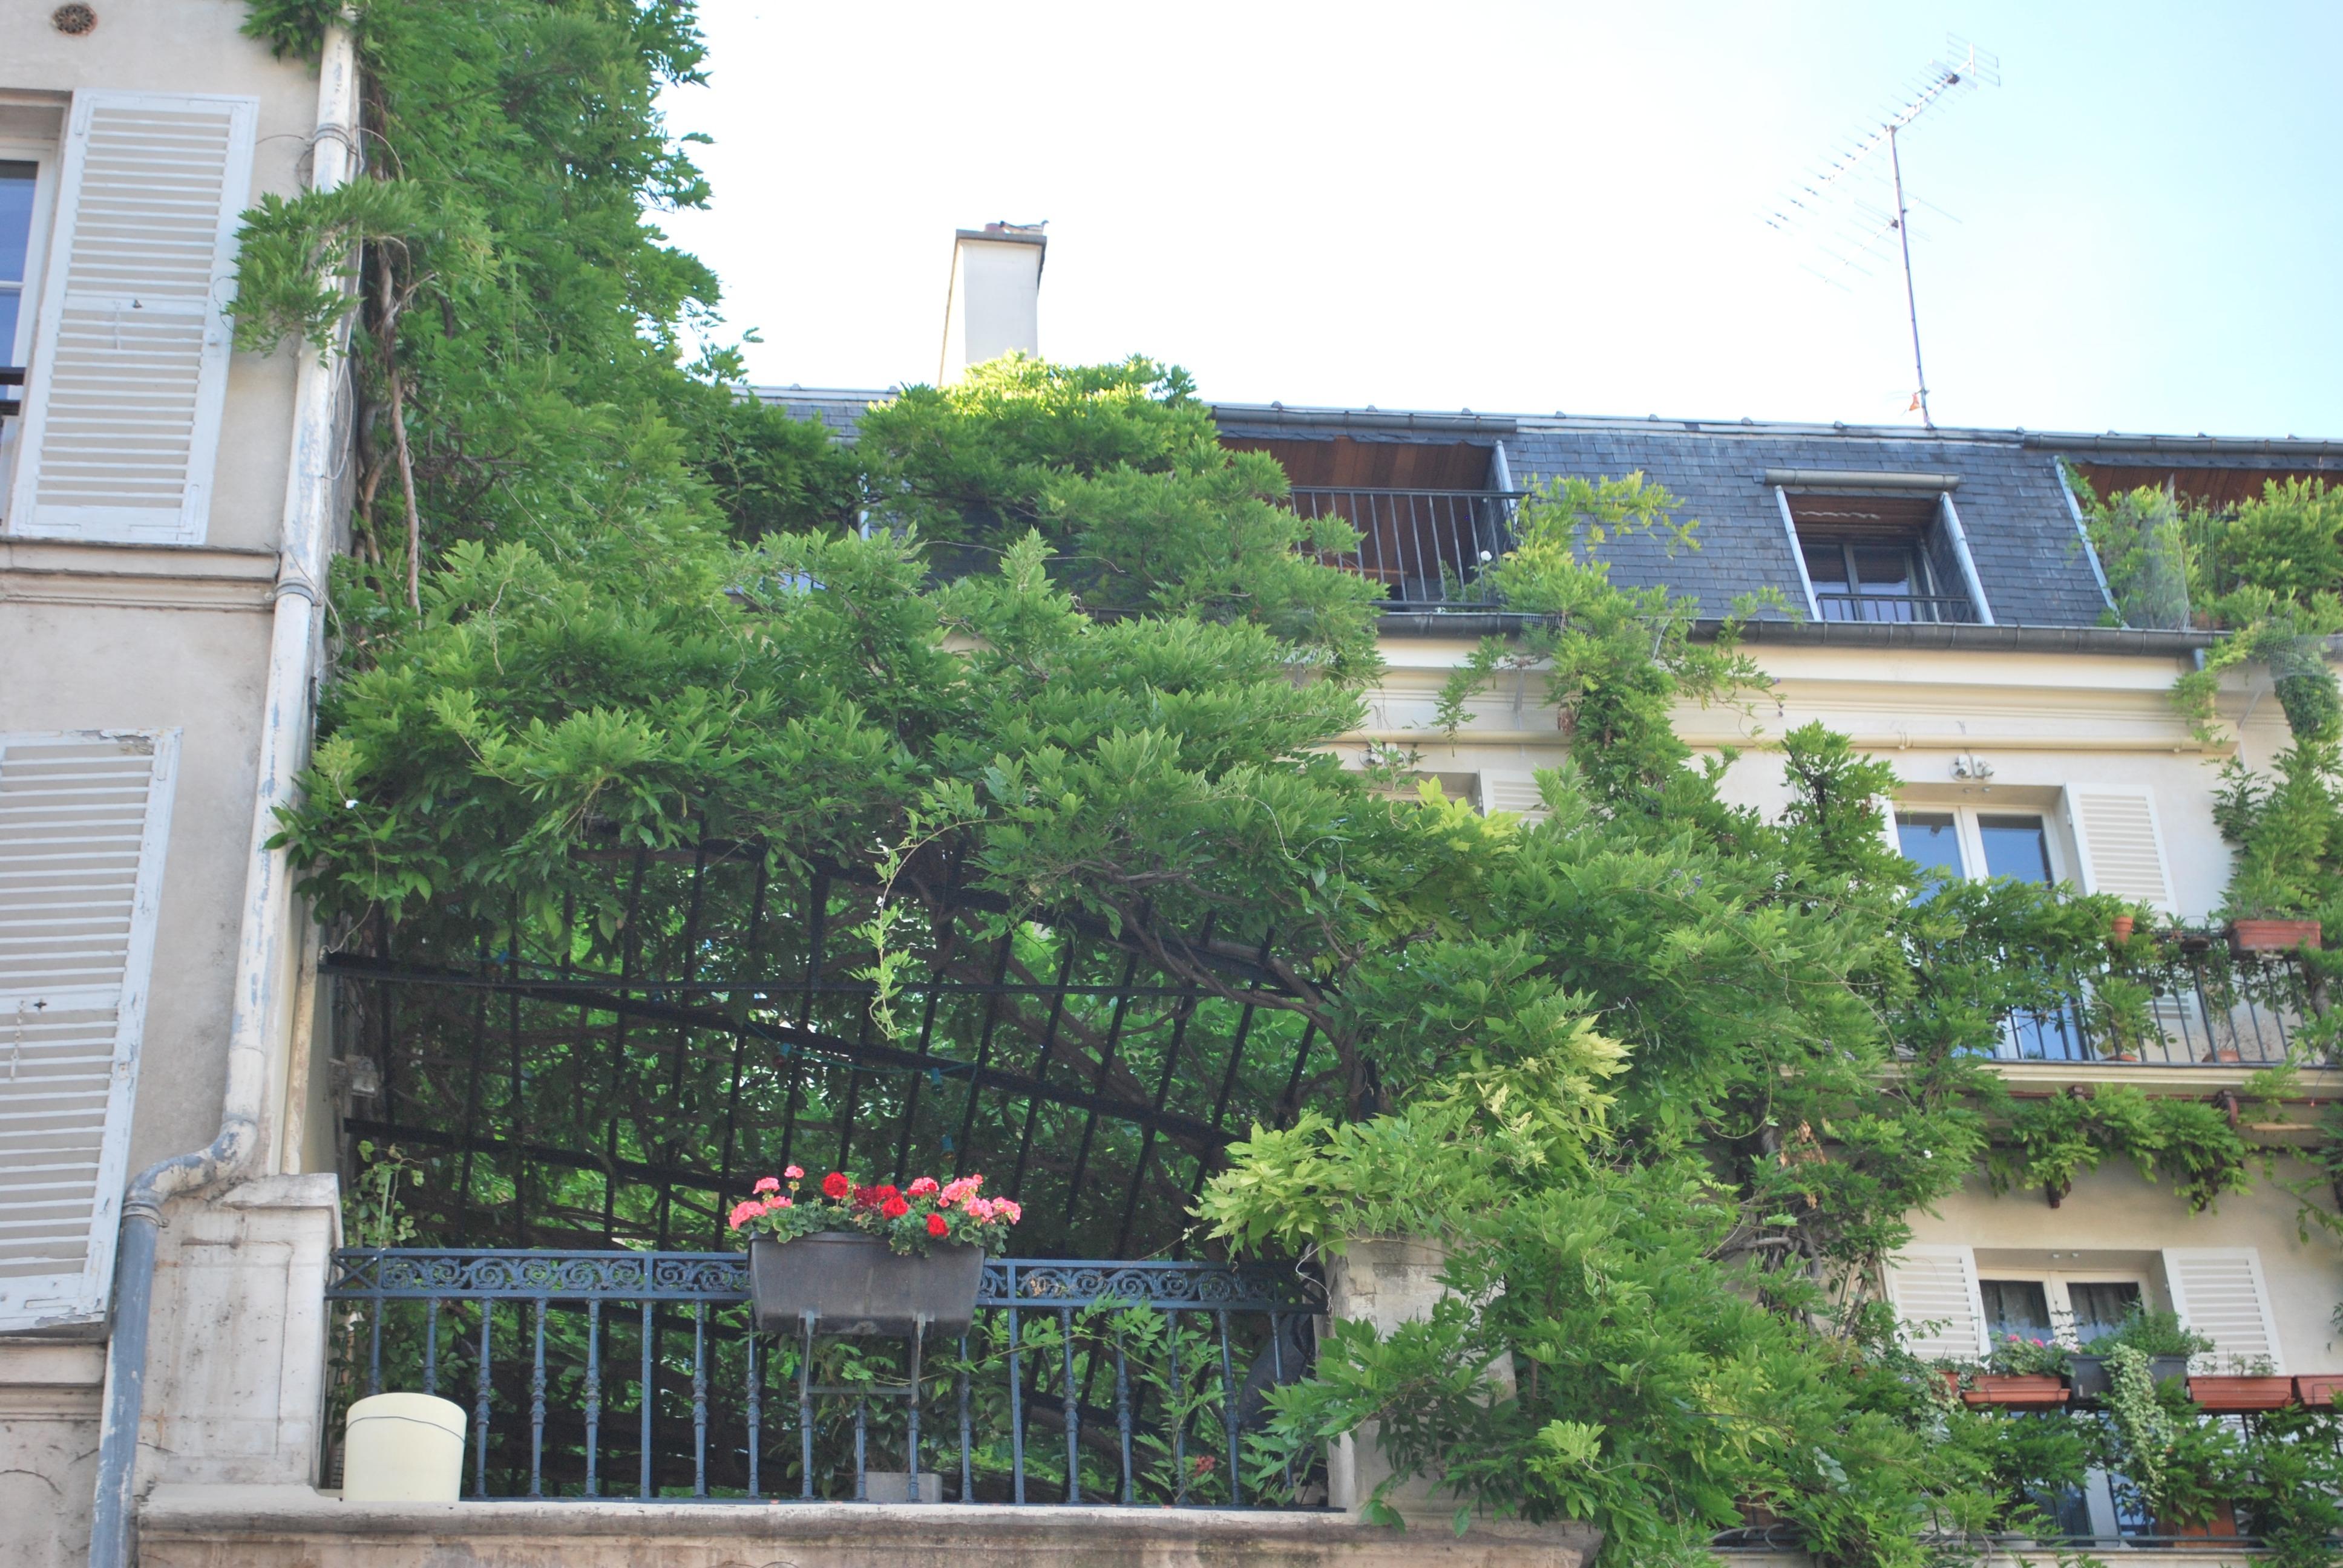 paris-marais-street-scene